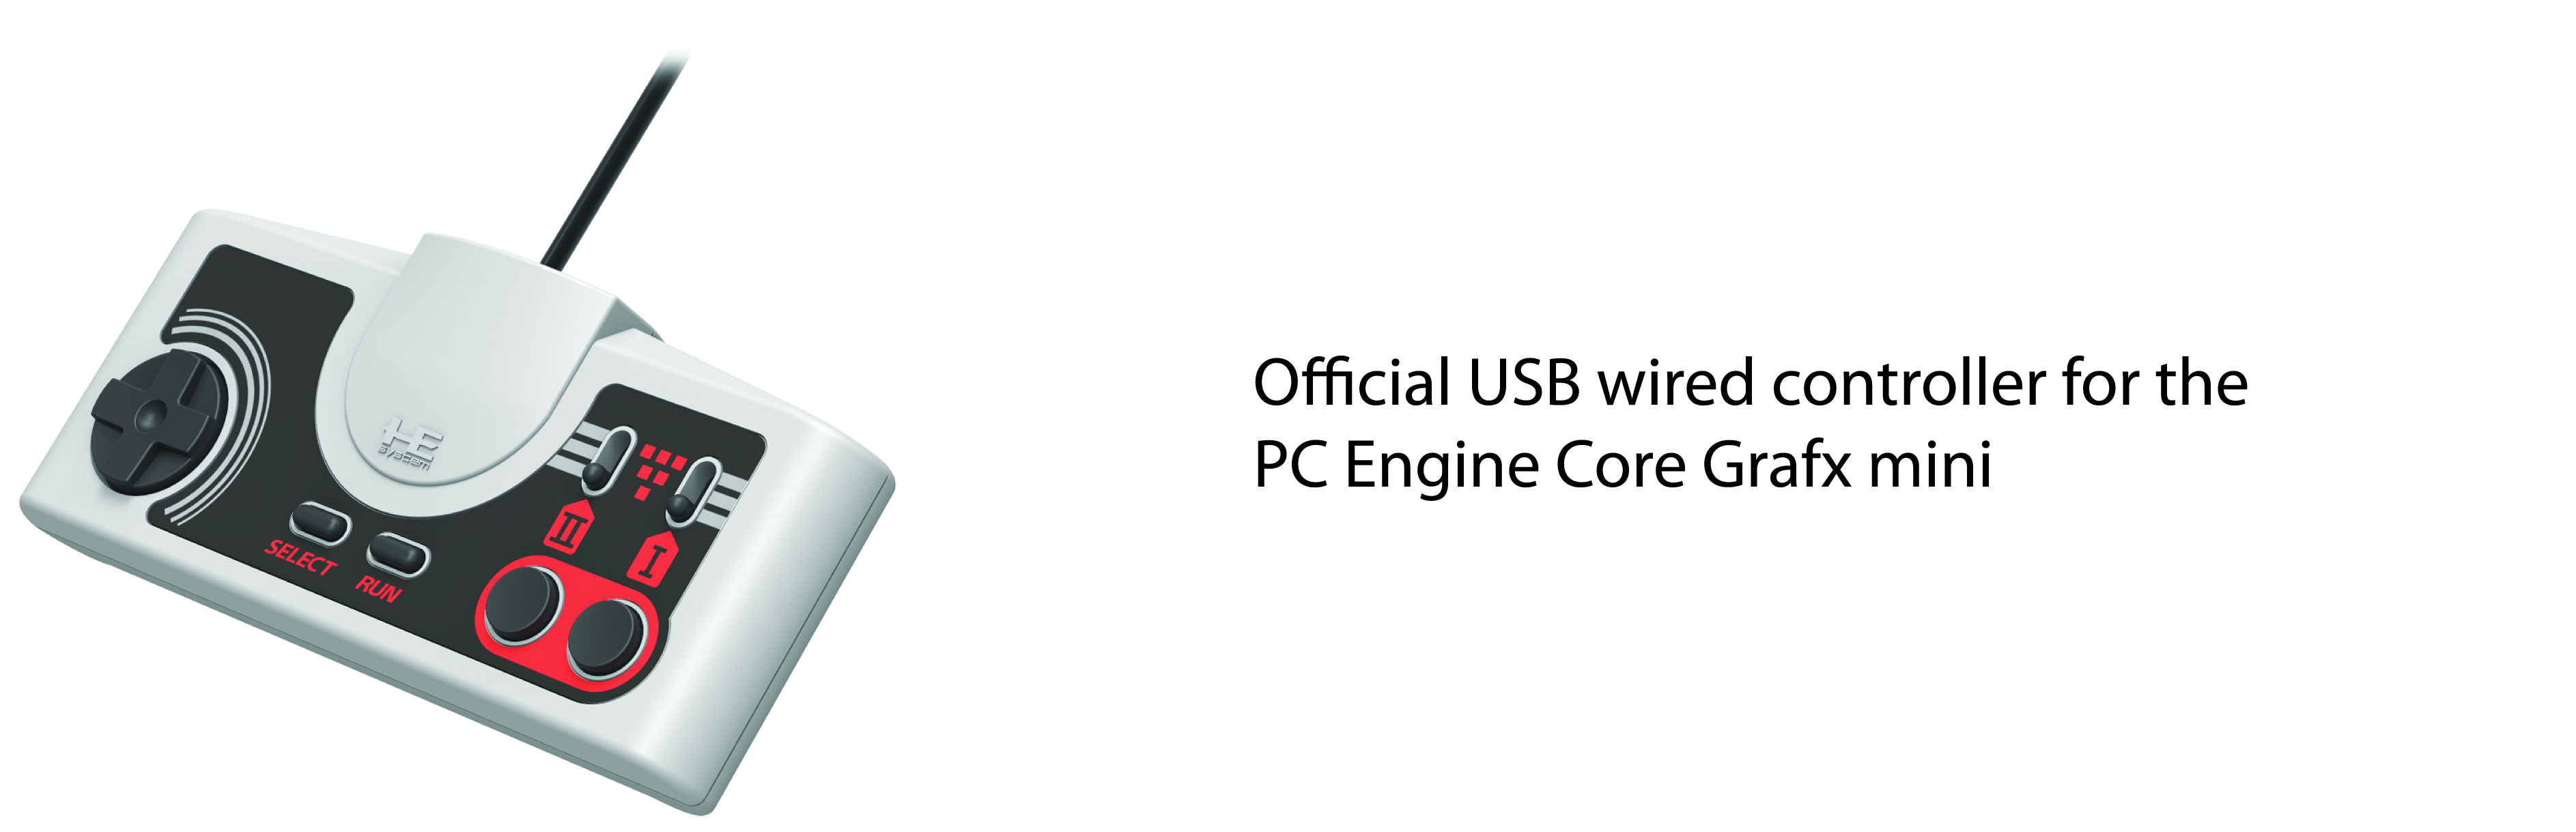 pc-engine-core-grafx-mini-controller-pad-a-1.jpg